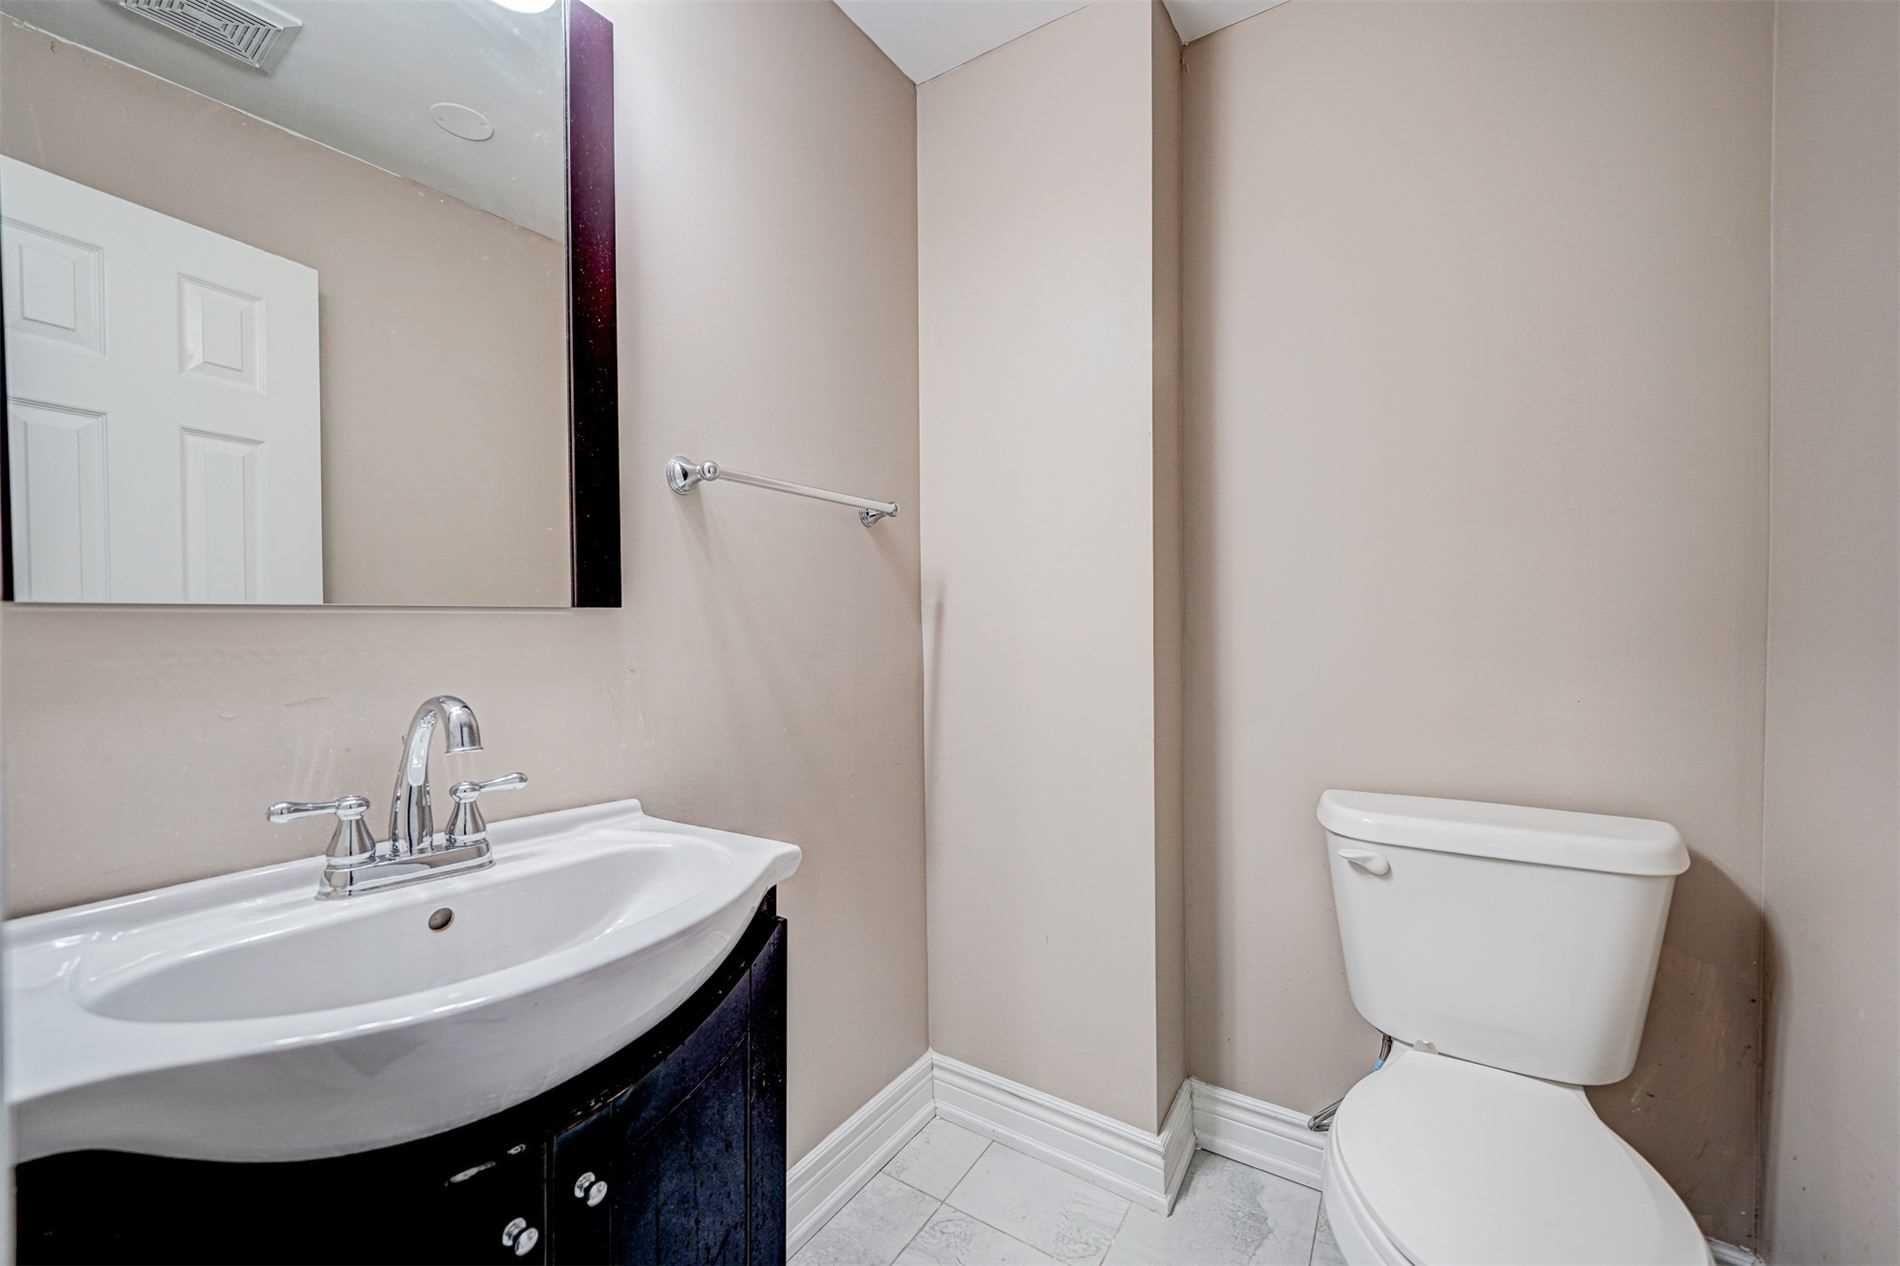 767 Philbrook Dr - Coates Detached for sale, 4 Bedrooms (W5399020) - #39